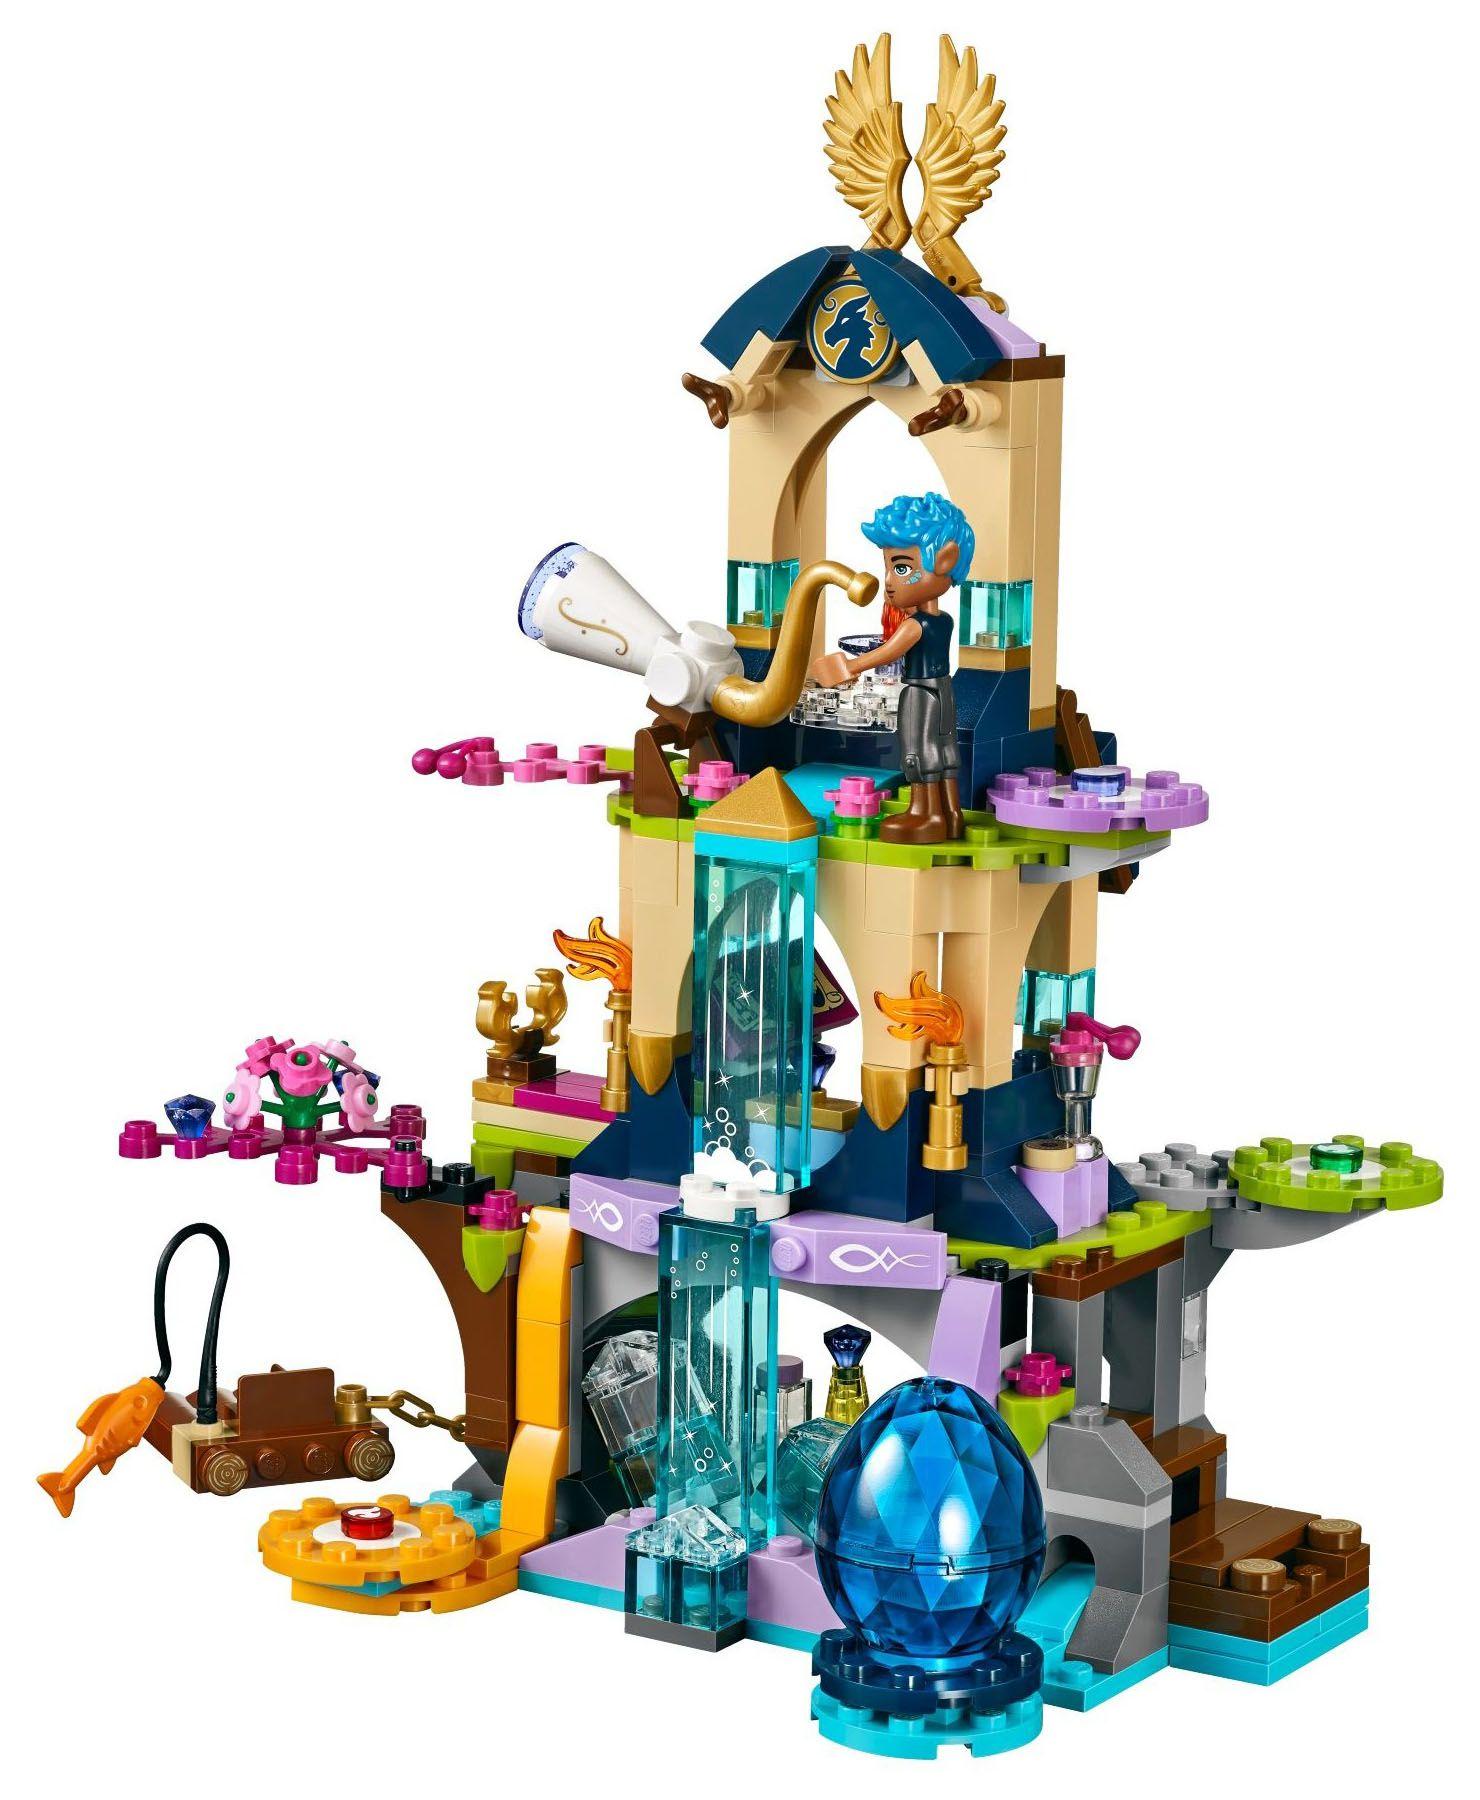 Girl Friends Dragon Sanctuary Building Bricks For Elves Toys DIY Educational